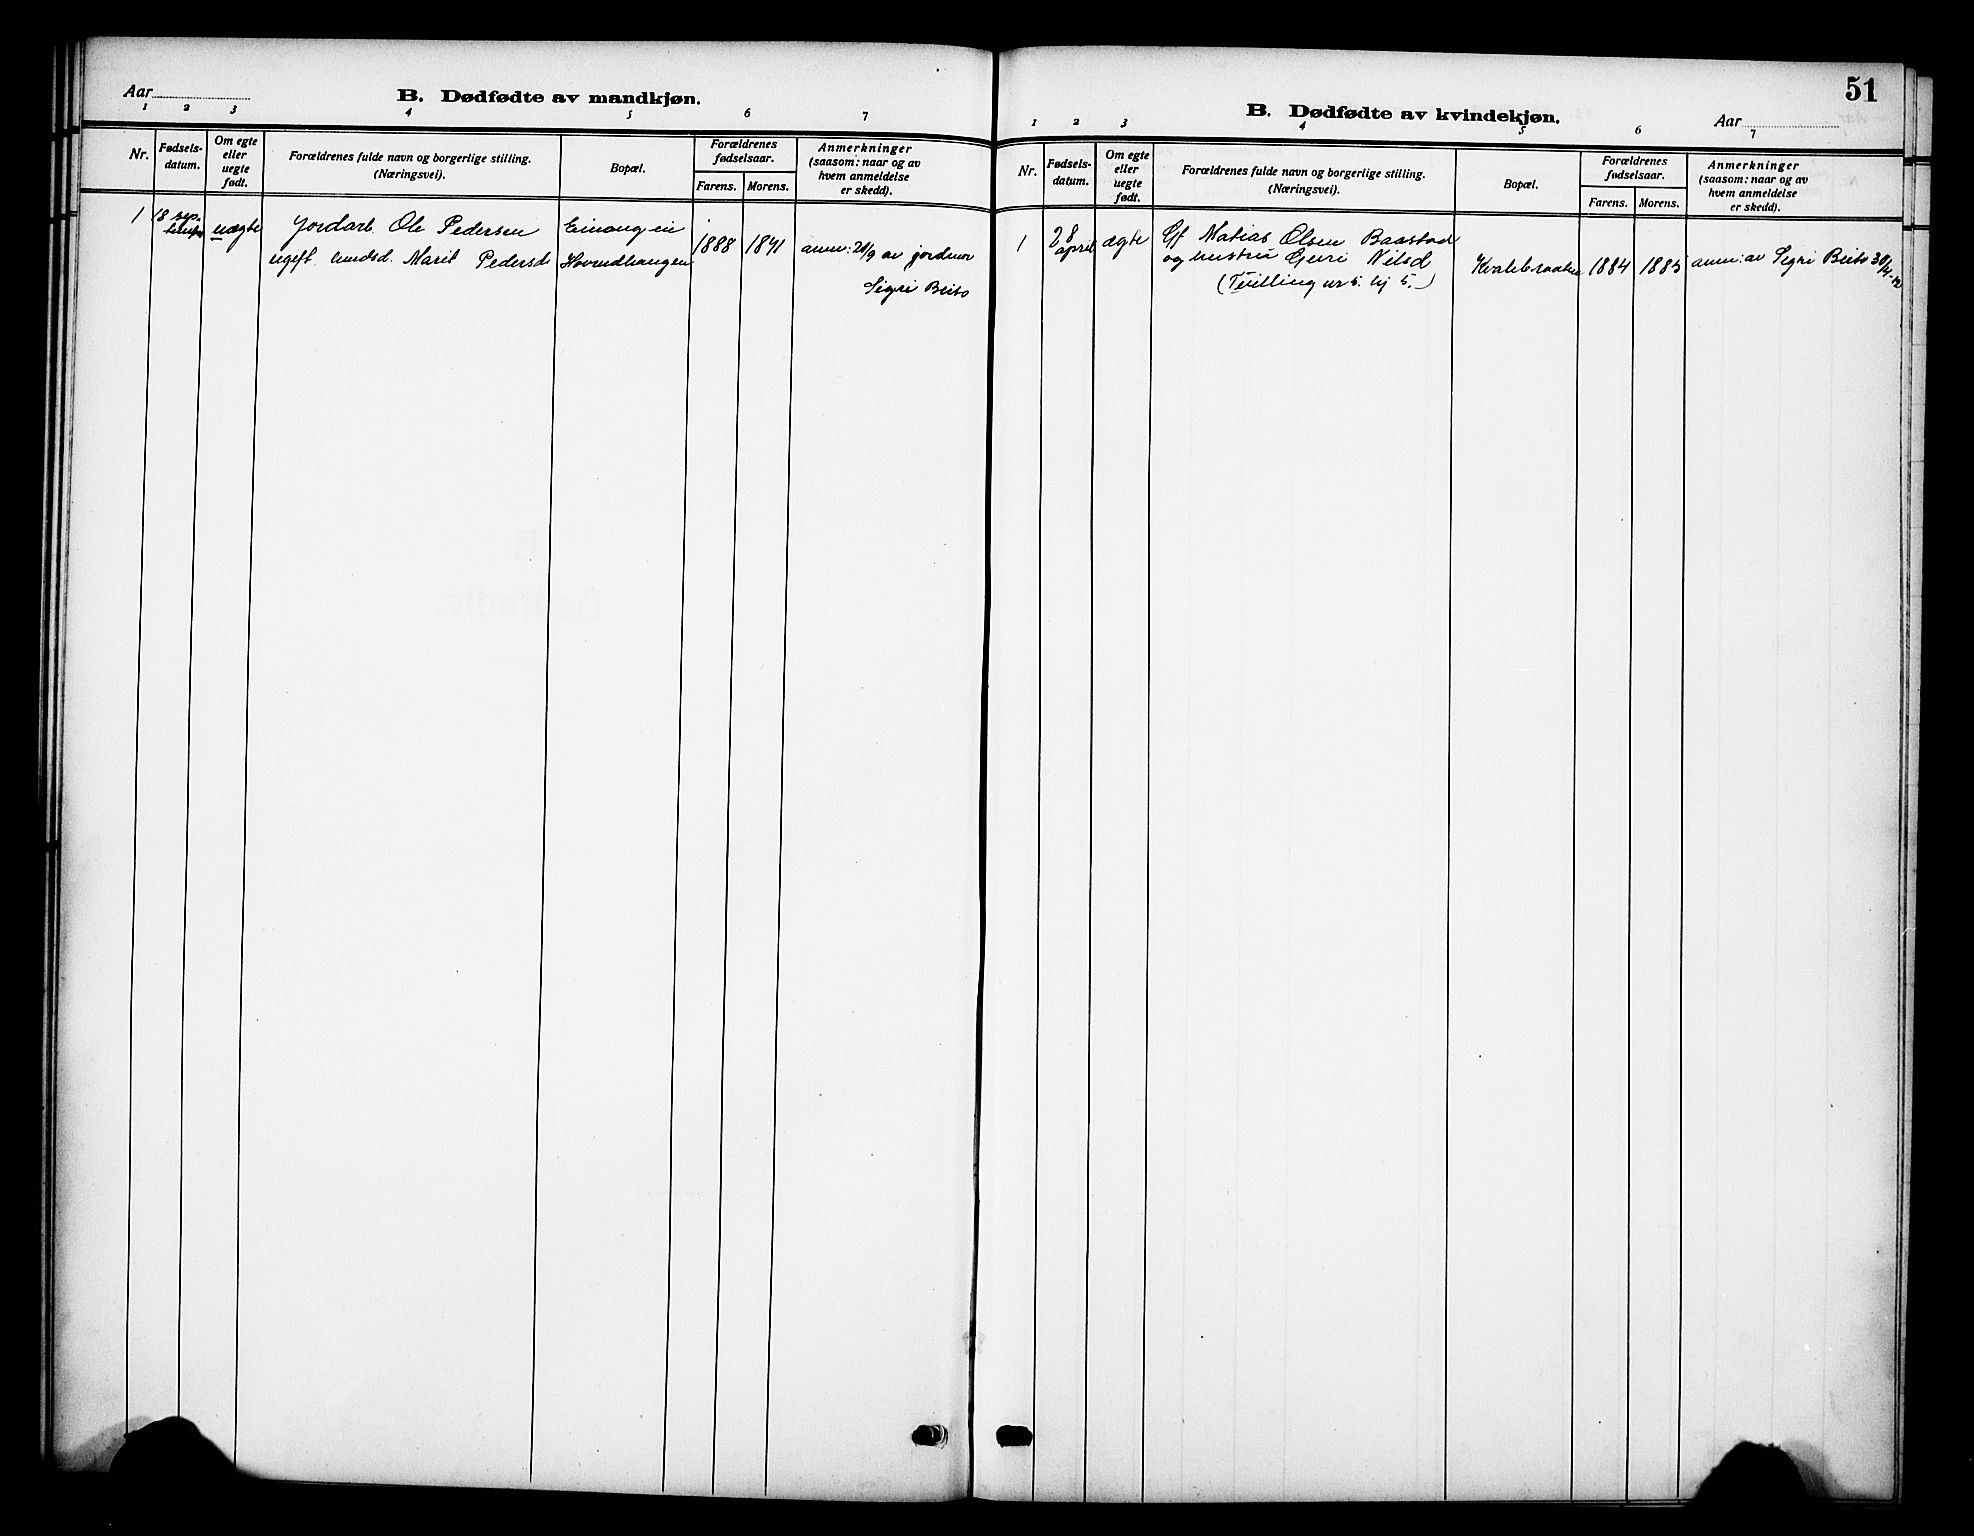 SAH, Vestre Slidre prestekontor, Klokkerbok nr. 7, 1909-1930, s. 51